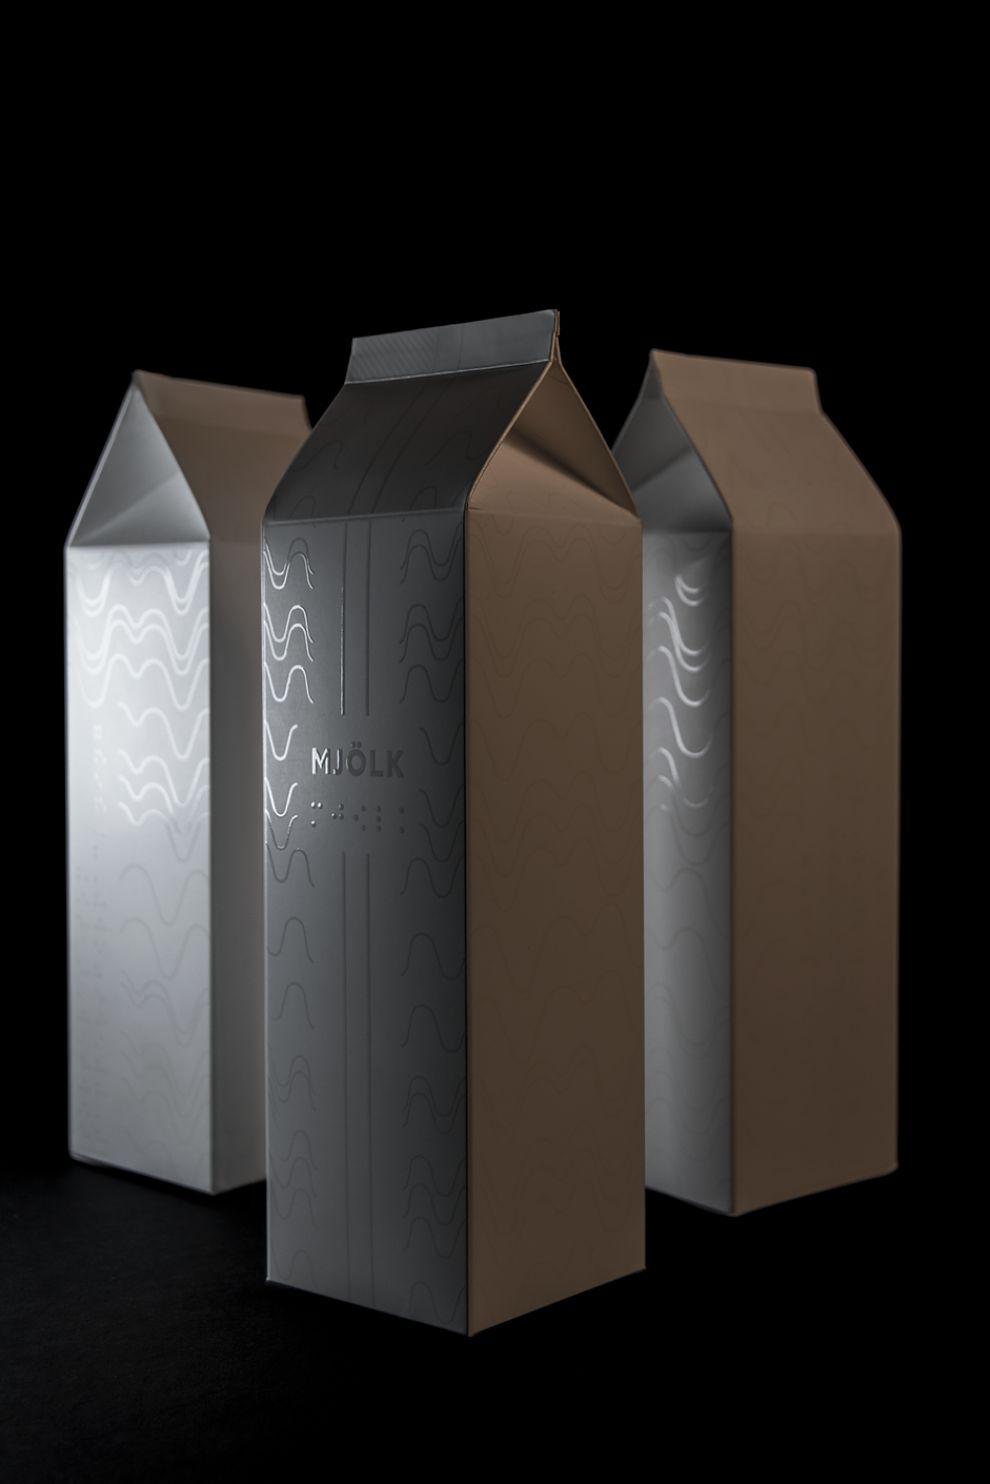 Color Me Blind Simple Package Design